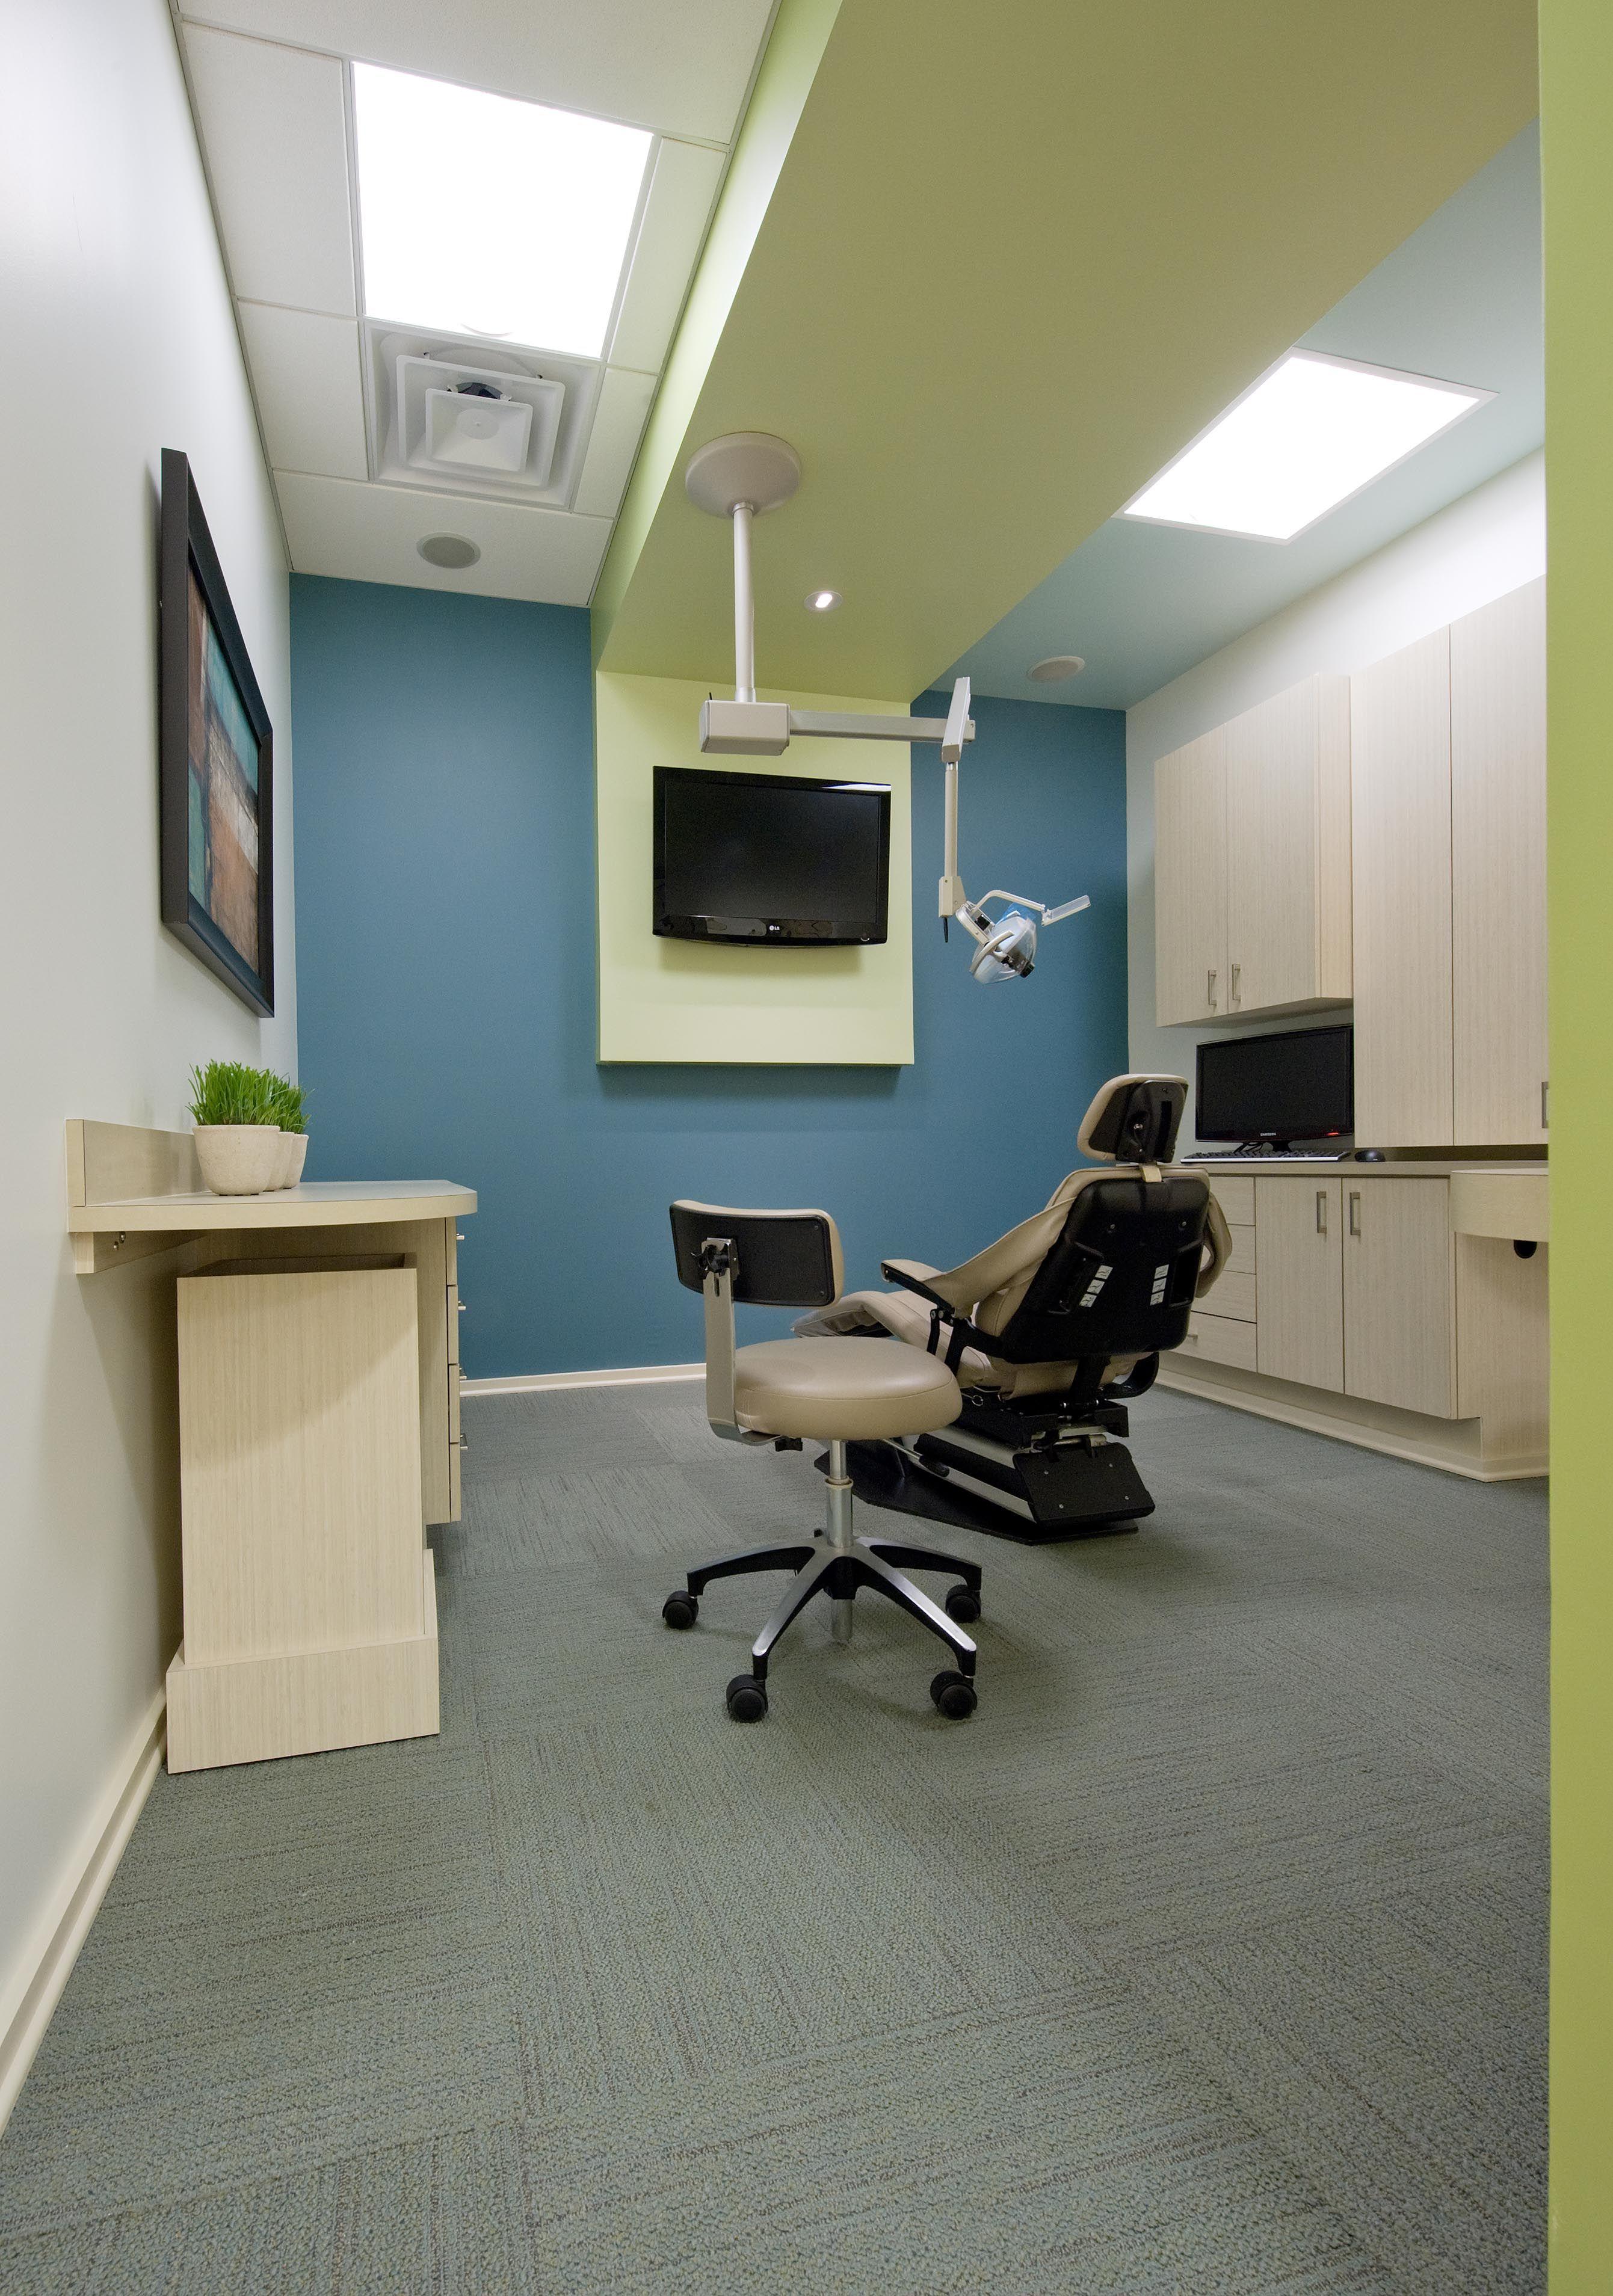 European Dental Office Design With Images Dental Office Decor